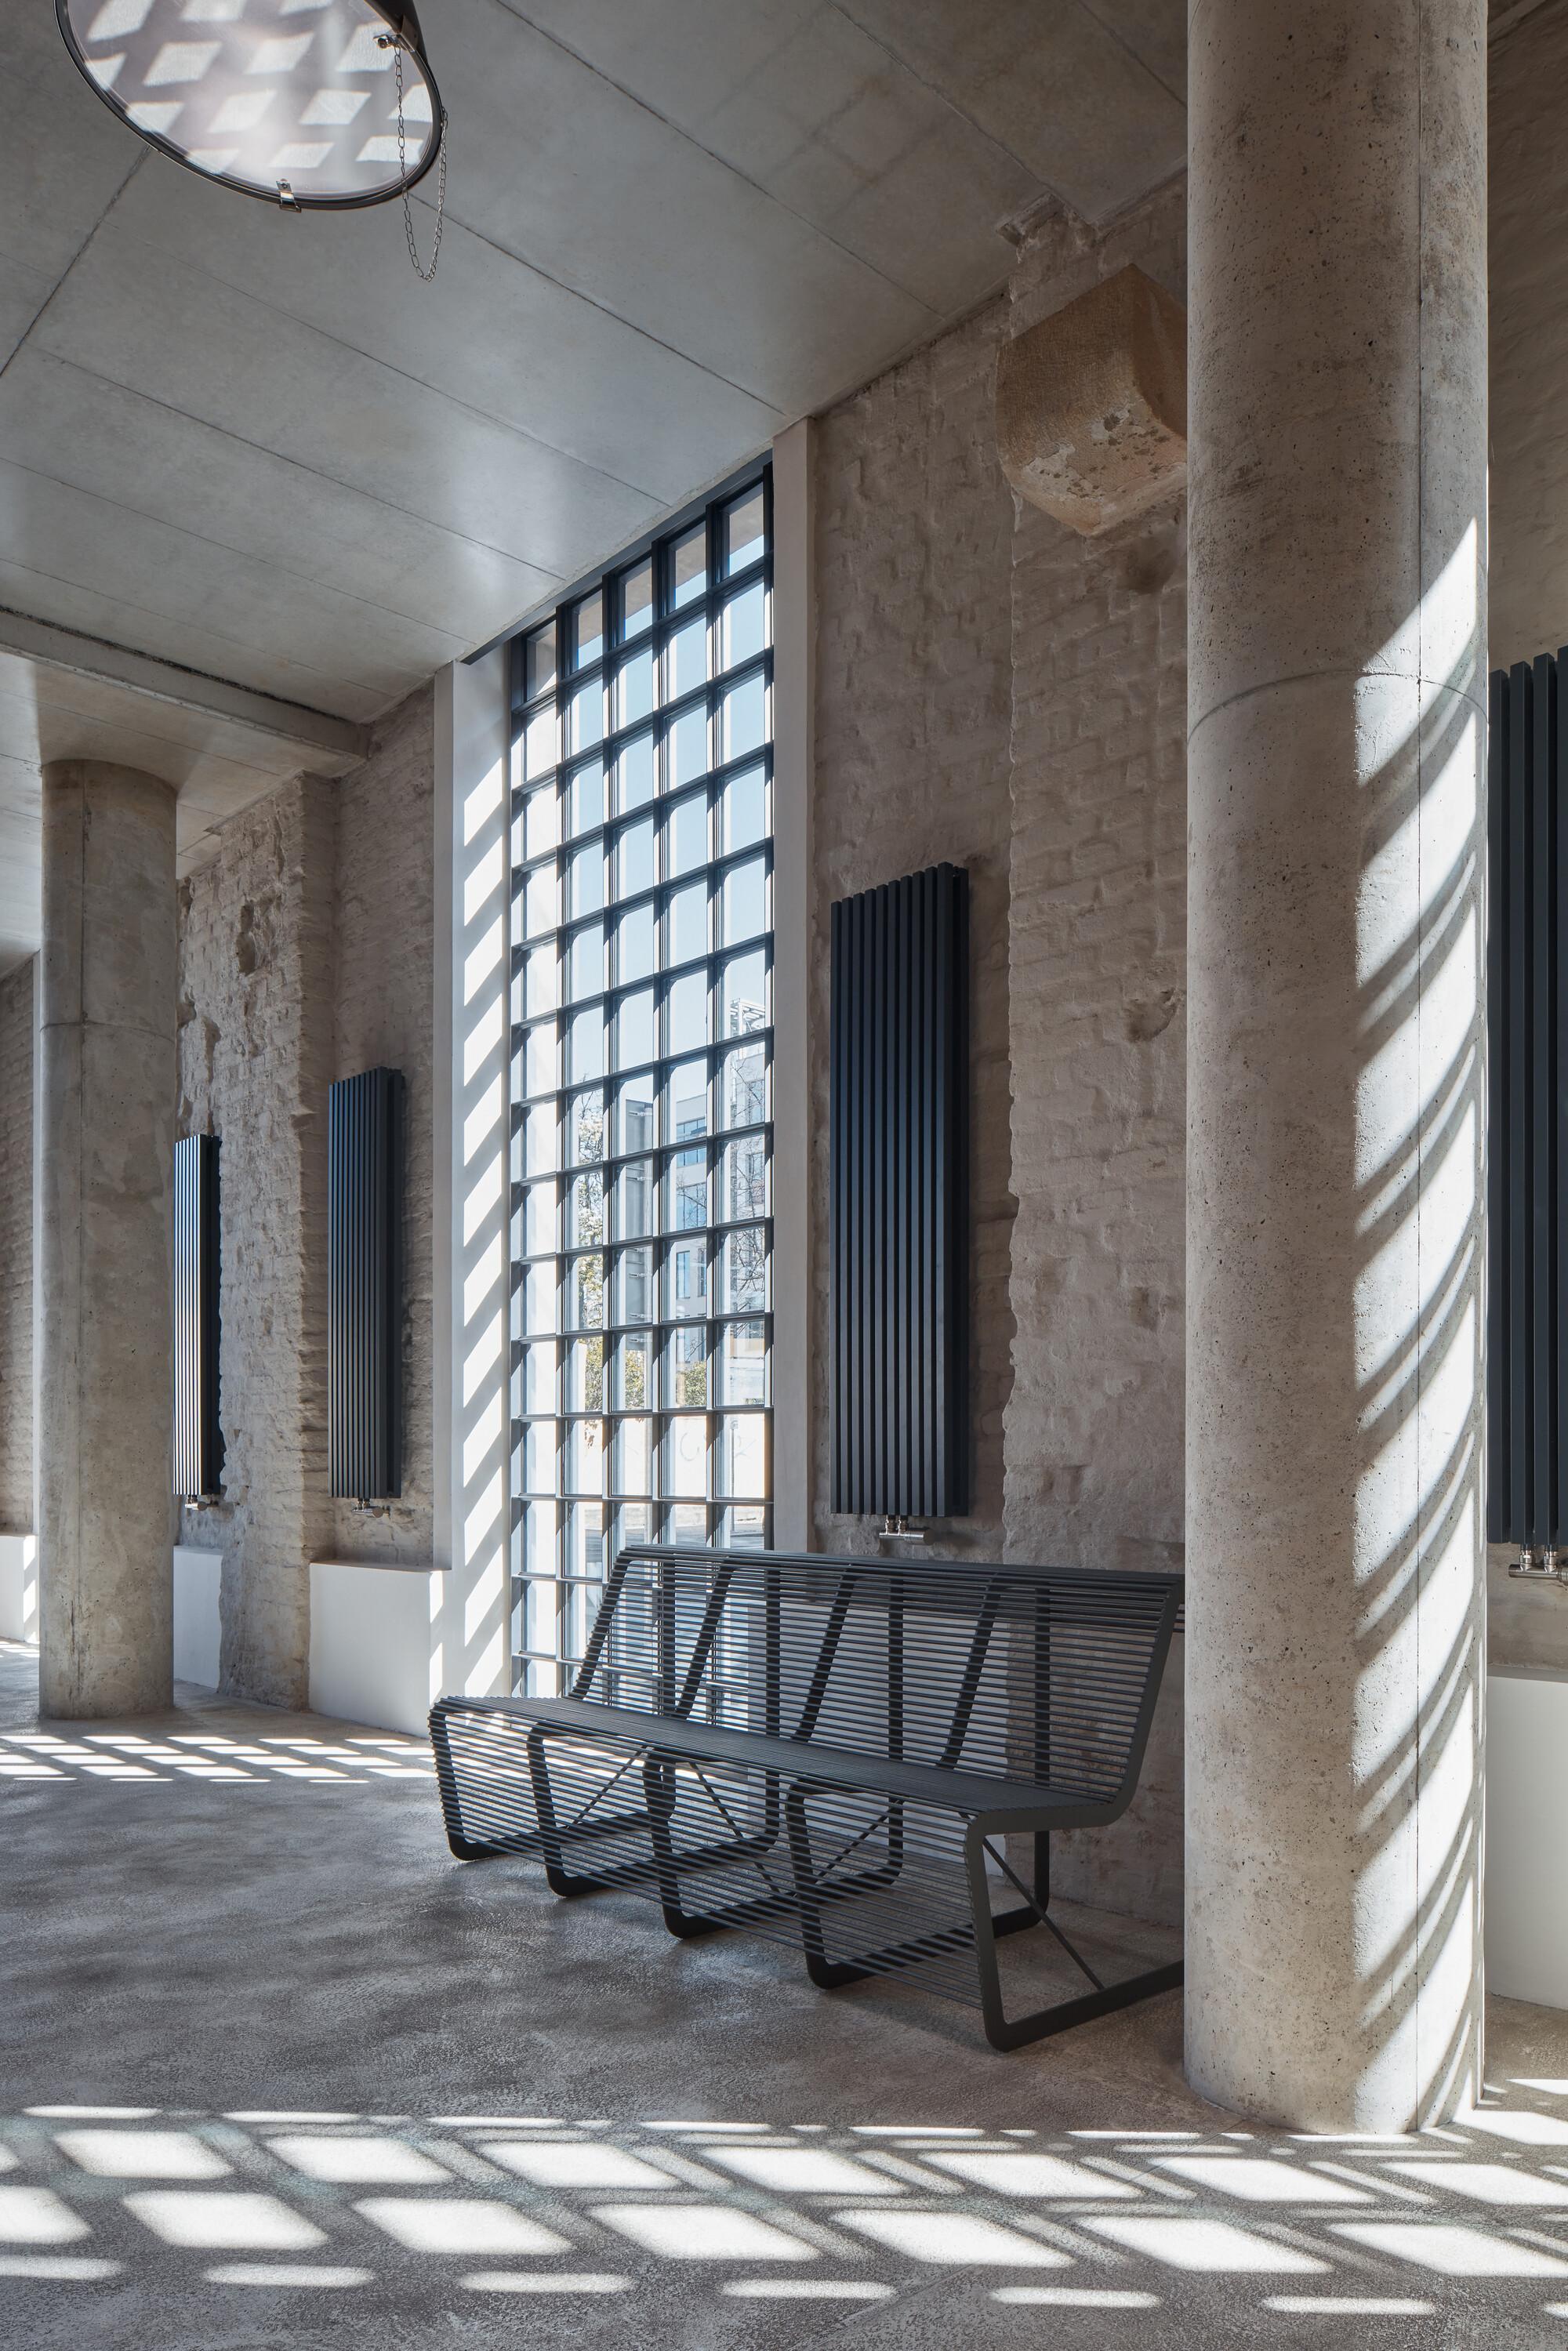 five-qarta-architektura-boysplaynice-18